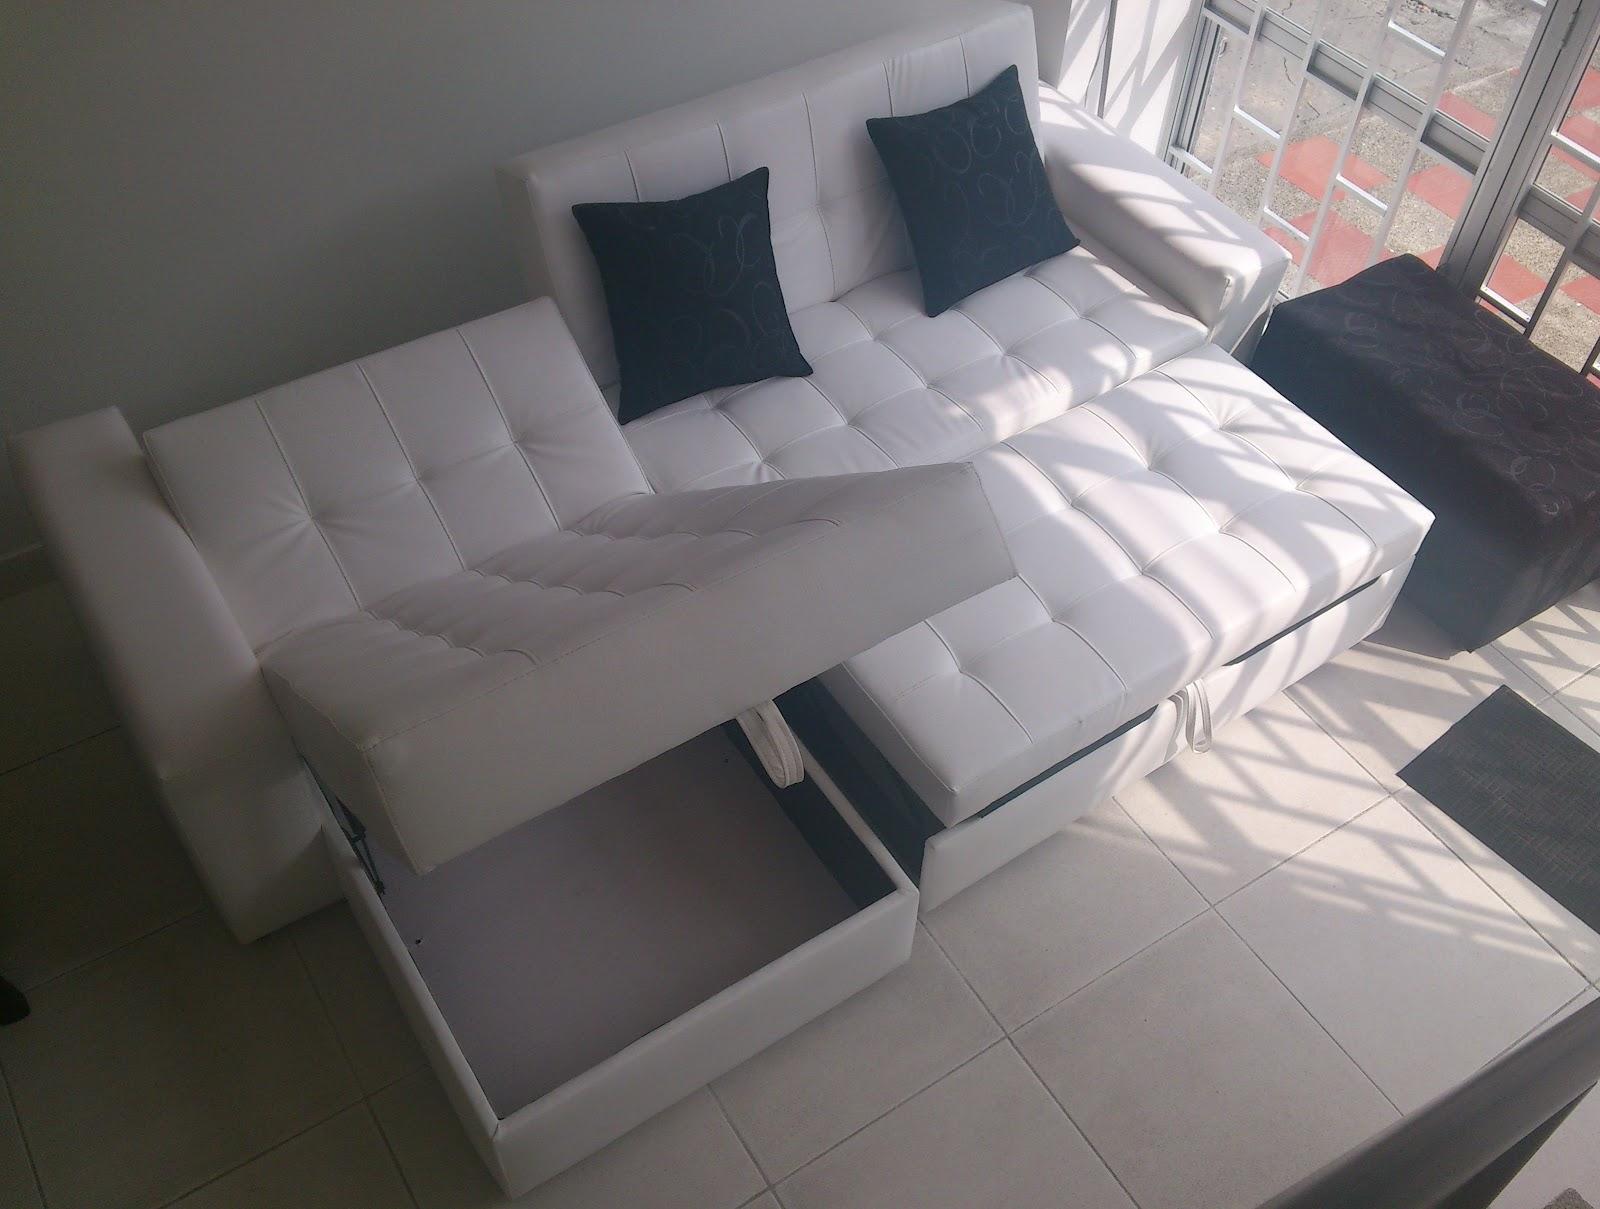 sofa cama bogota colombia sofaer co yangon muebles alkar mueblesalkar